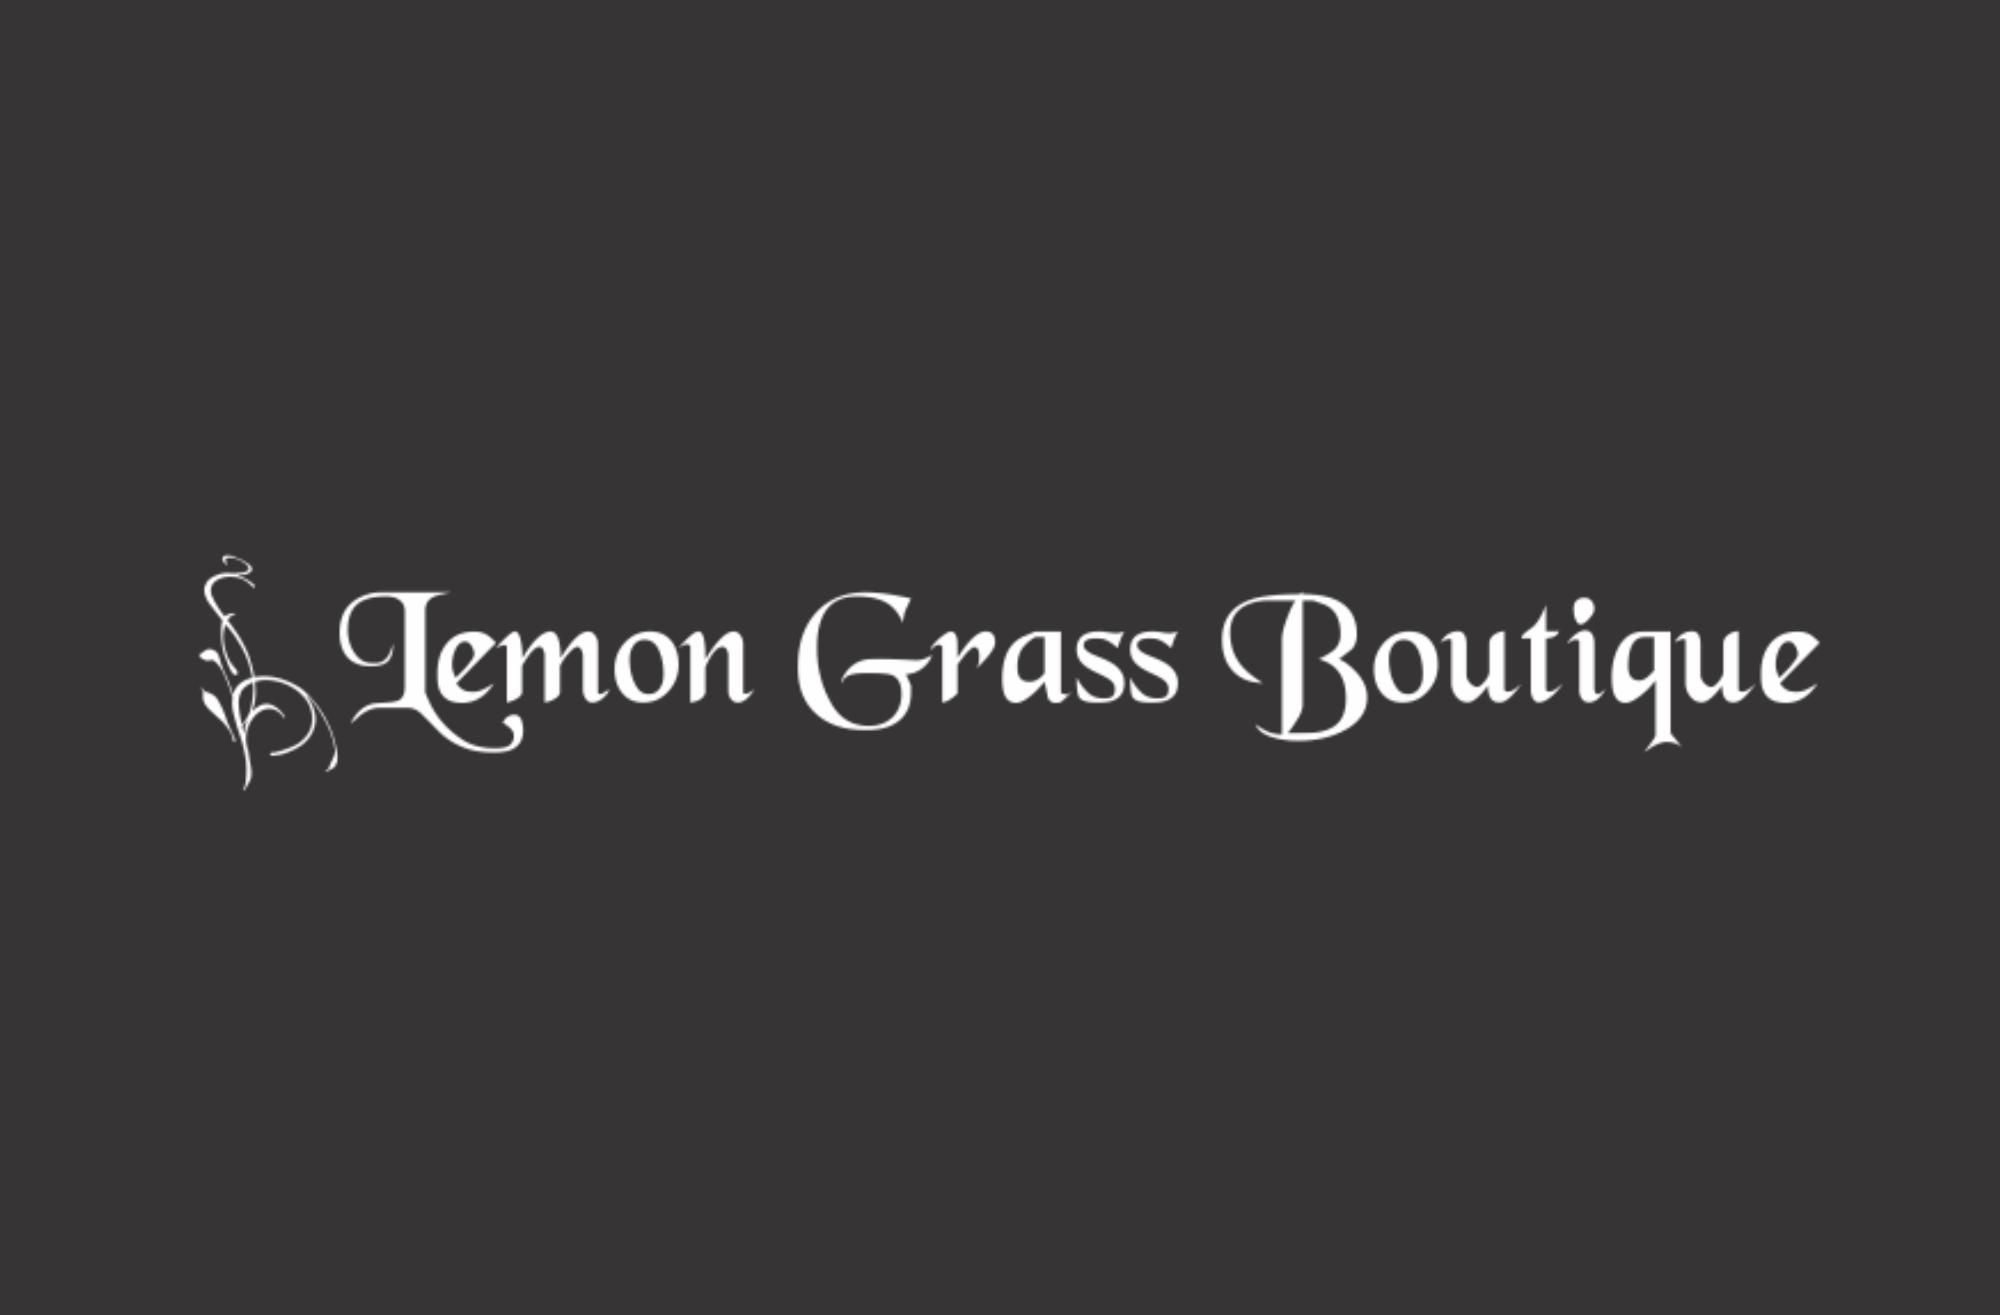 Lemongrass Boutique Logo Design, website design, Internet Marketing, eCommerce, CRM Lemongrass Boutique Logo Design, website design, Branding, Marketing, Website Maintenance and Hosting